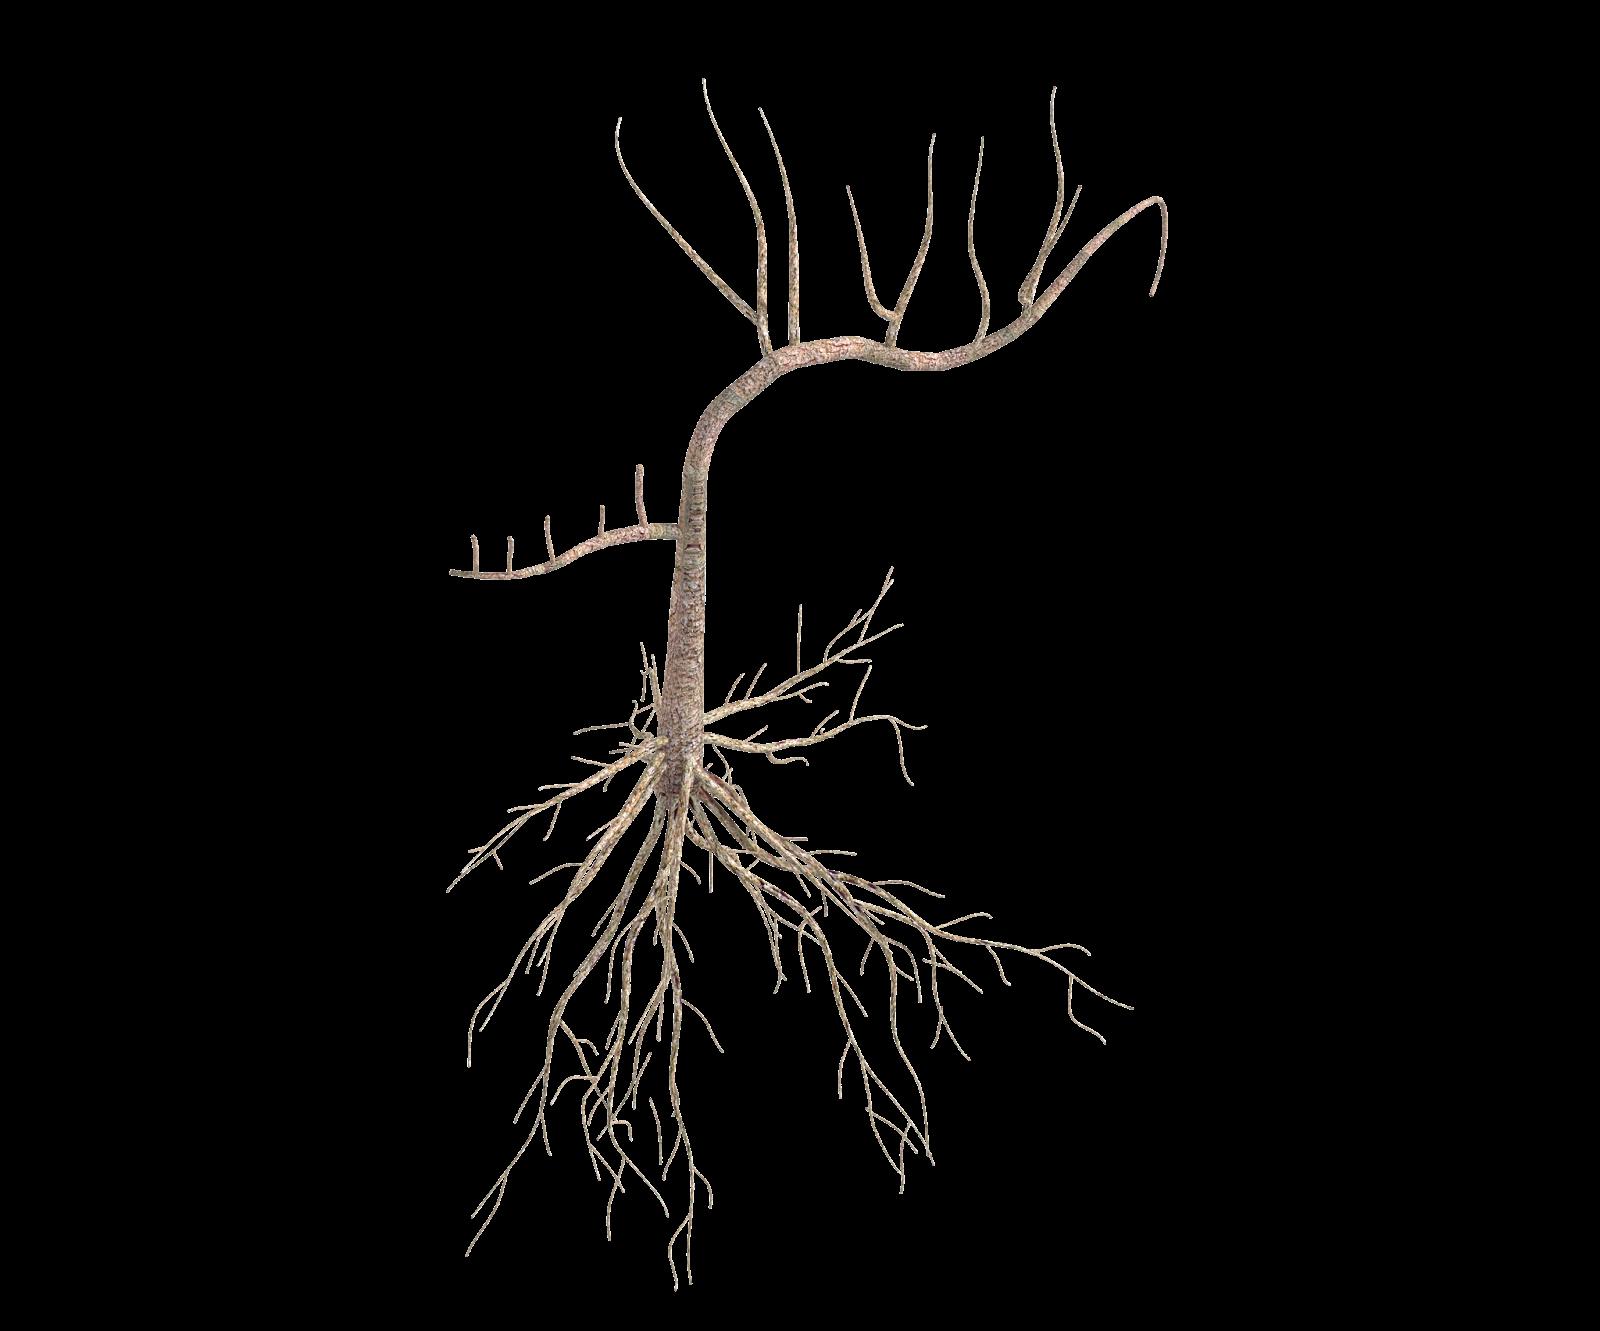 Roots Clipart Kapok Tree Roots Kapok Tree Transparent Free For